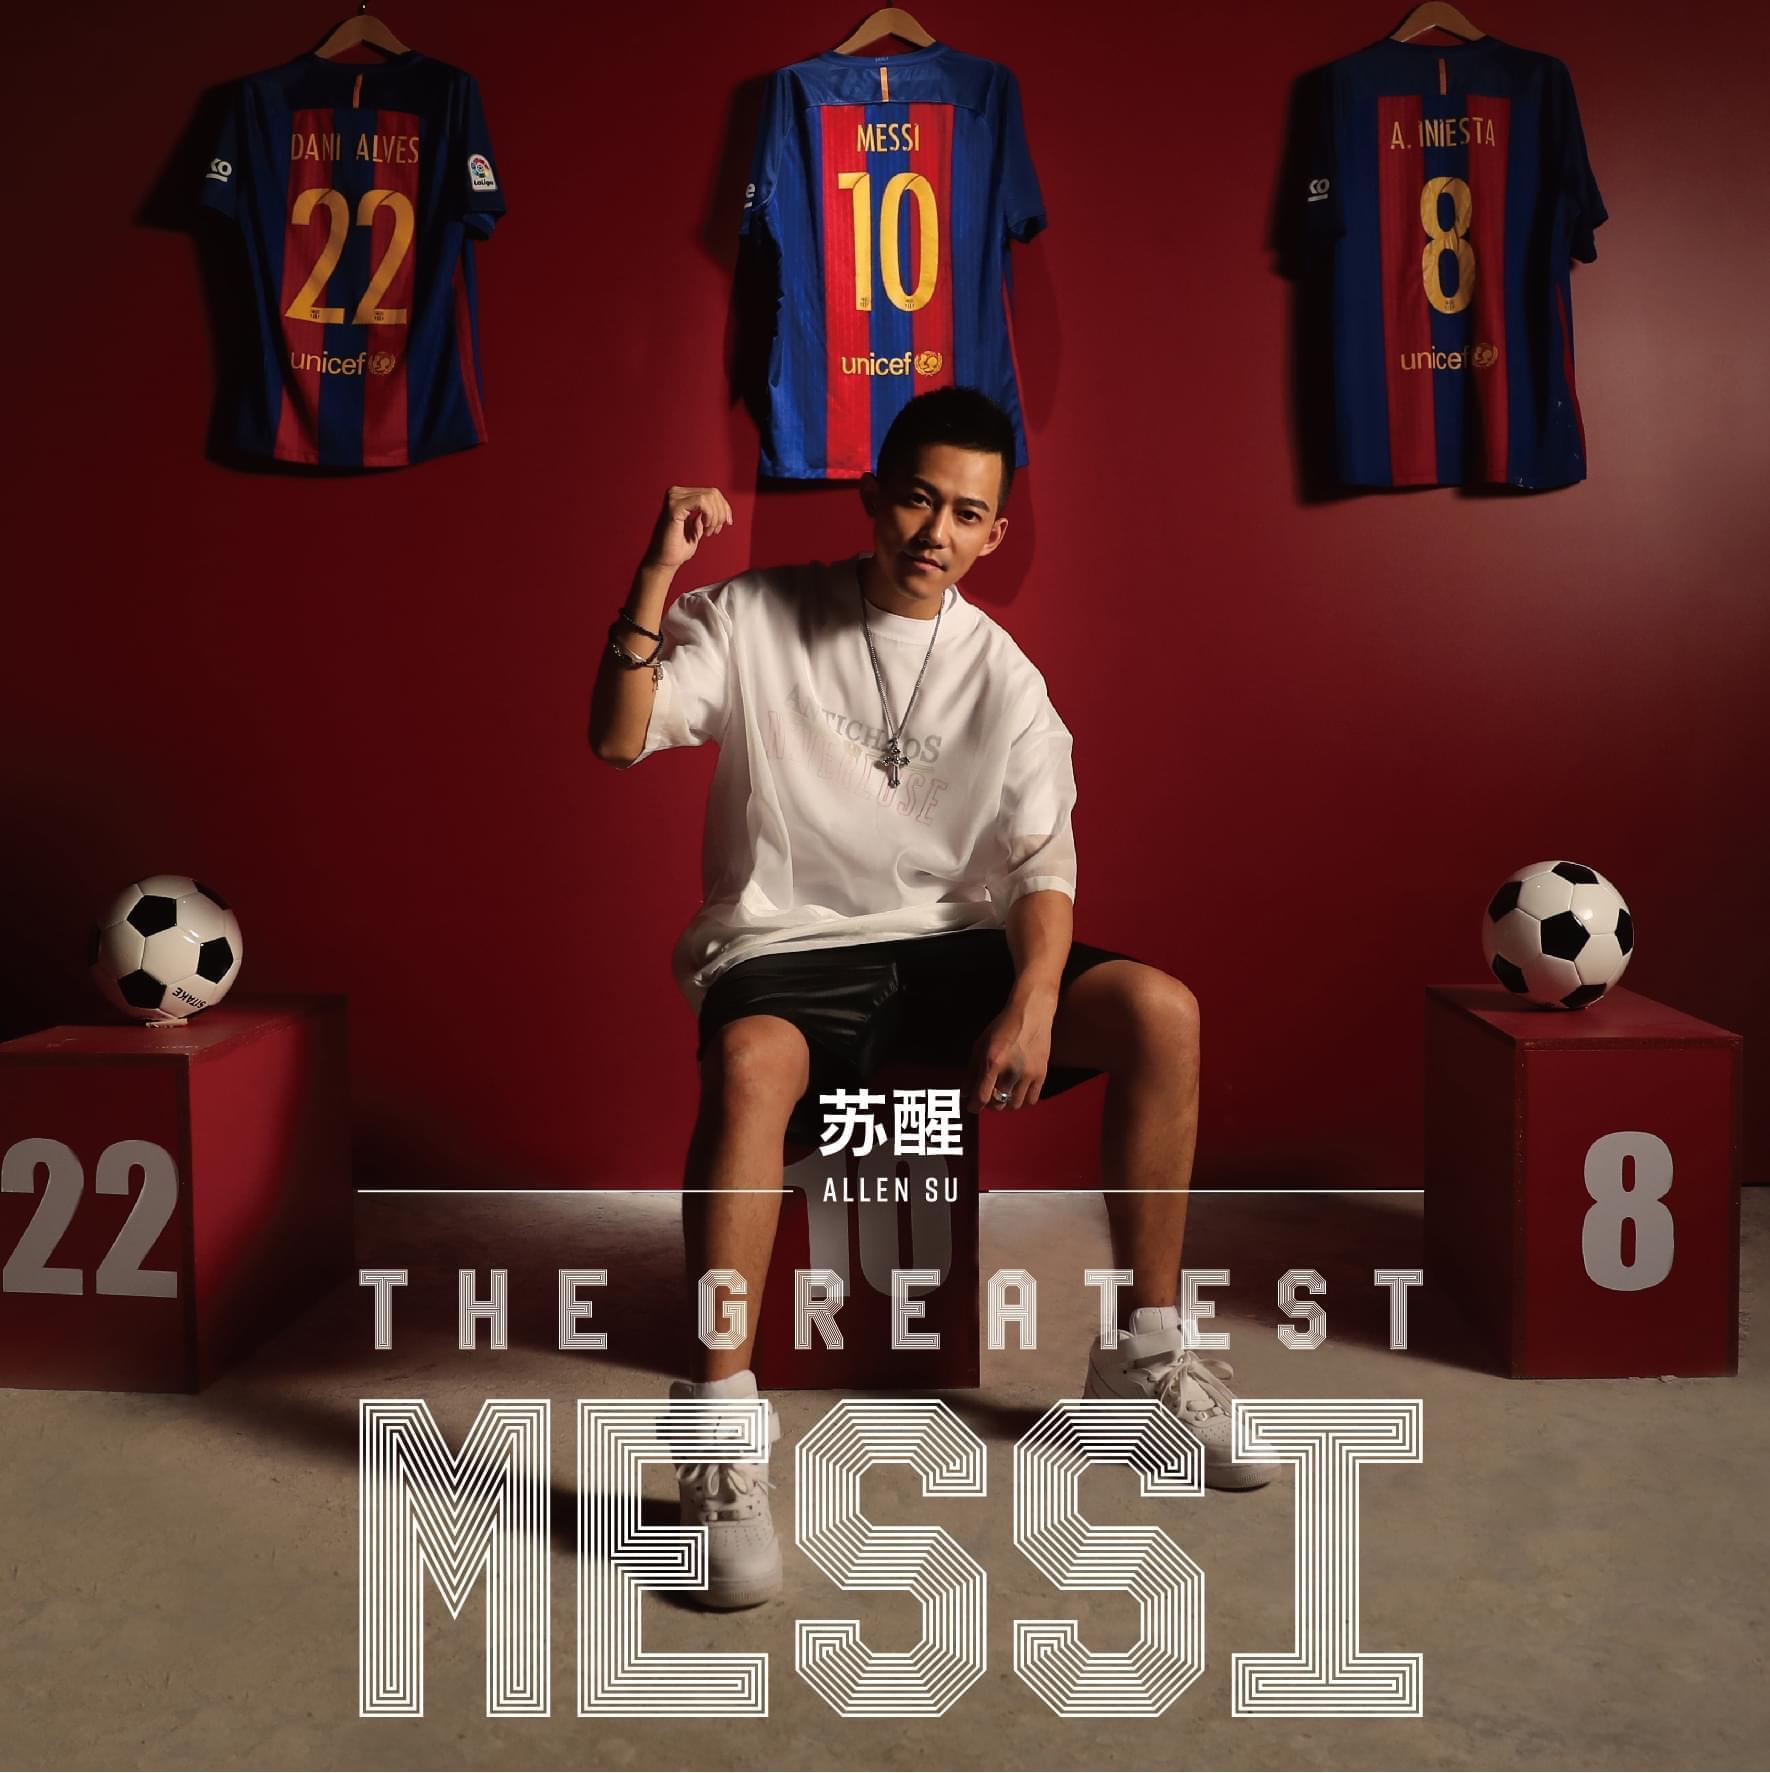 苏醒创作《The Greatest Messi》致敬偶像梅西